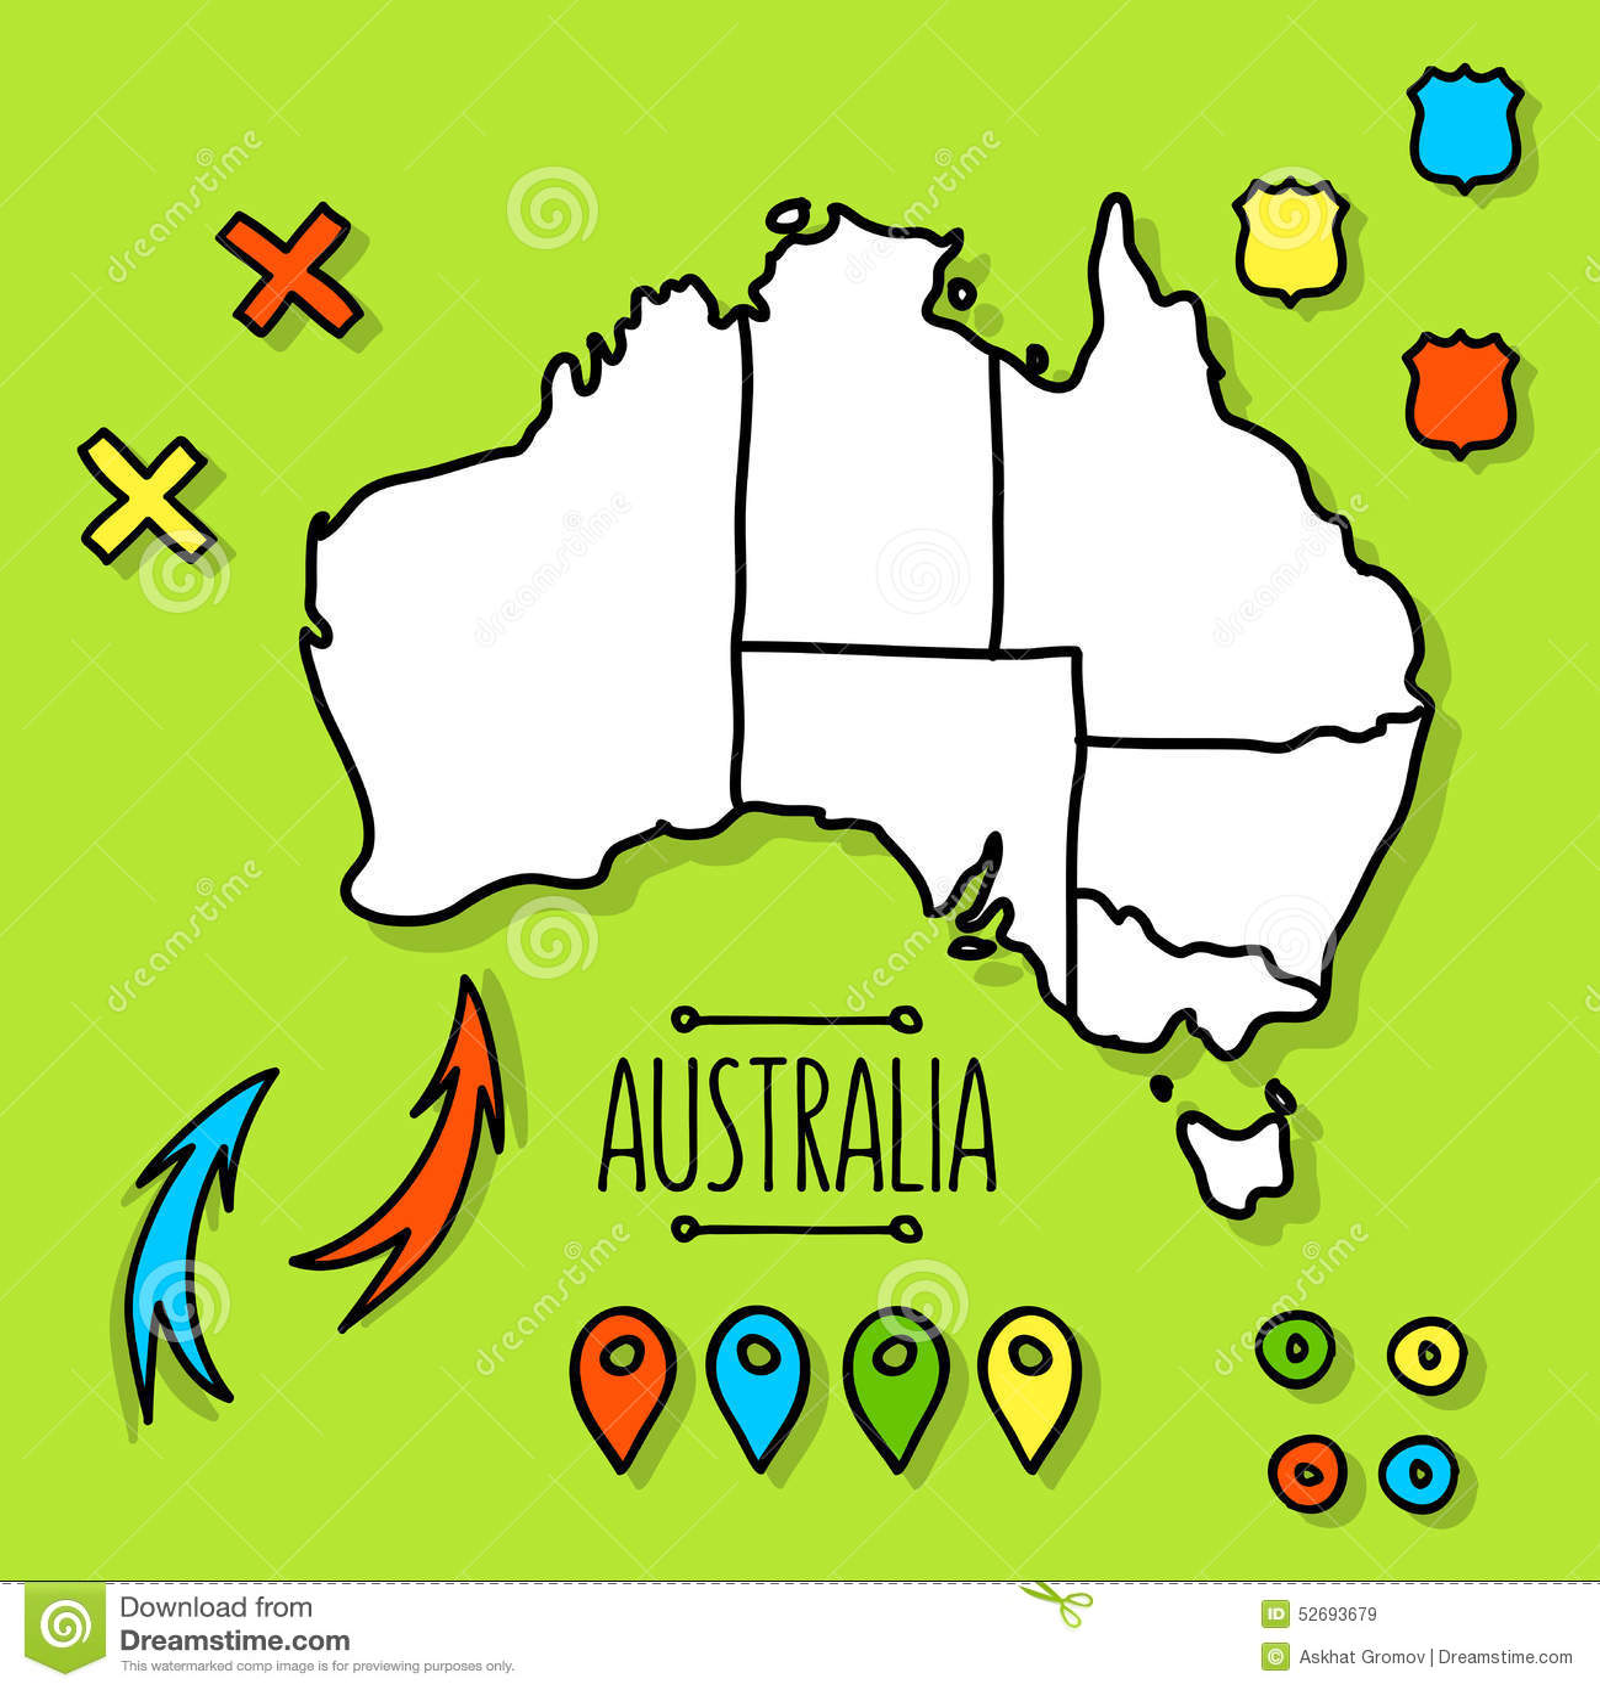 Freehand Australia Travel Map On Green Background Vector – Travel Map of Australia